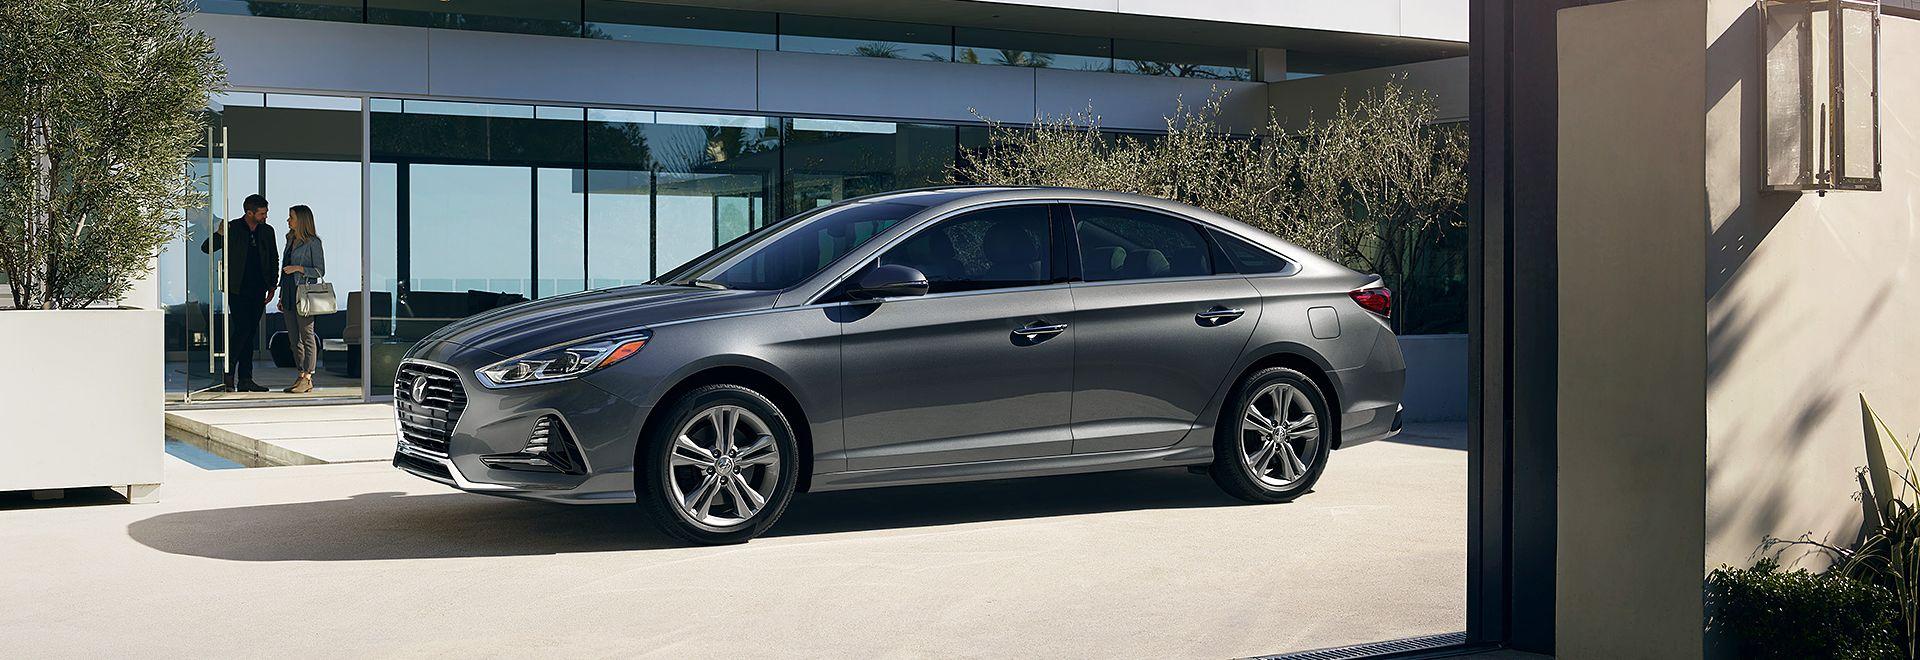 2018 Hyundai Sonata Leasing Near Bowie Md Pohanka Hyundai